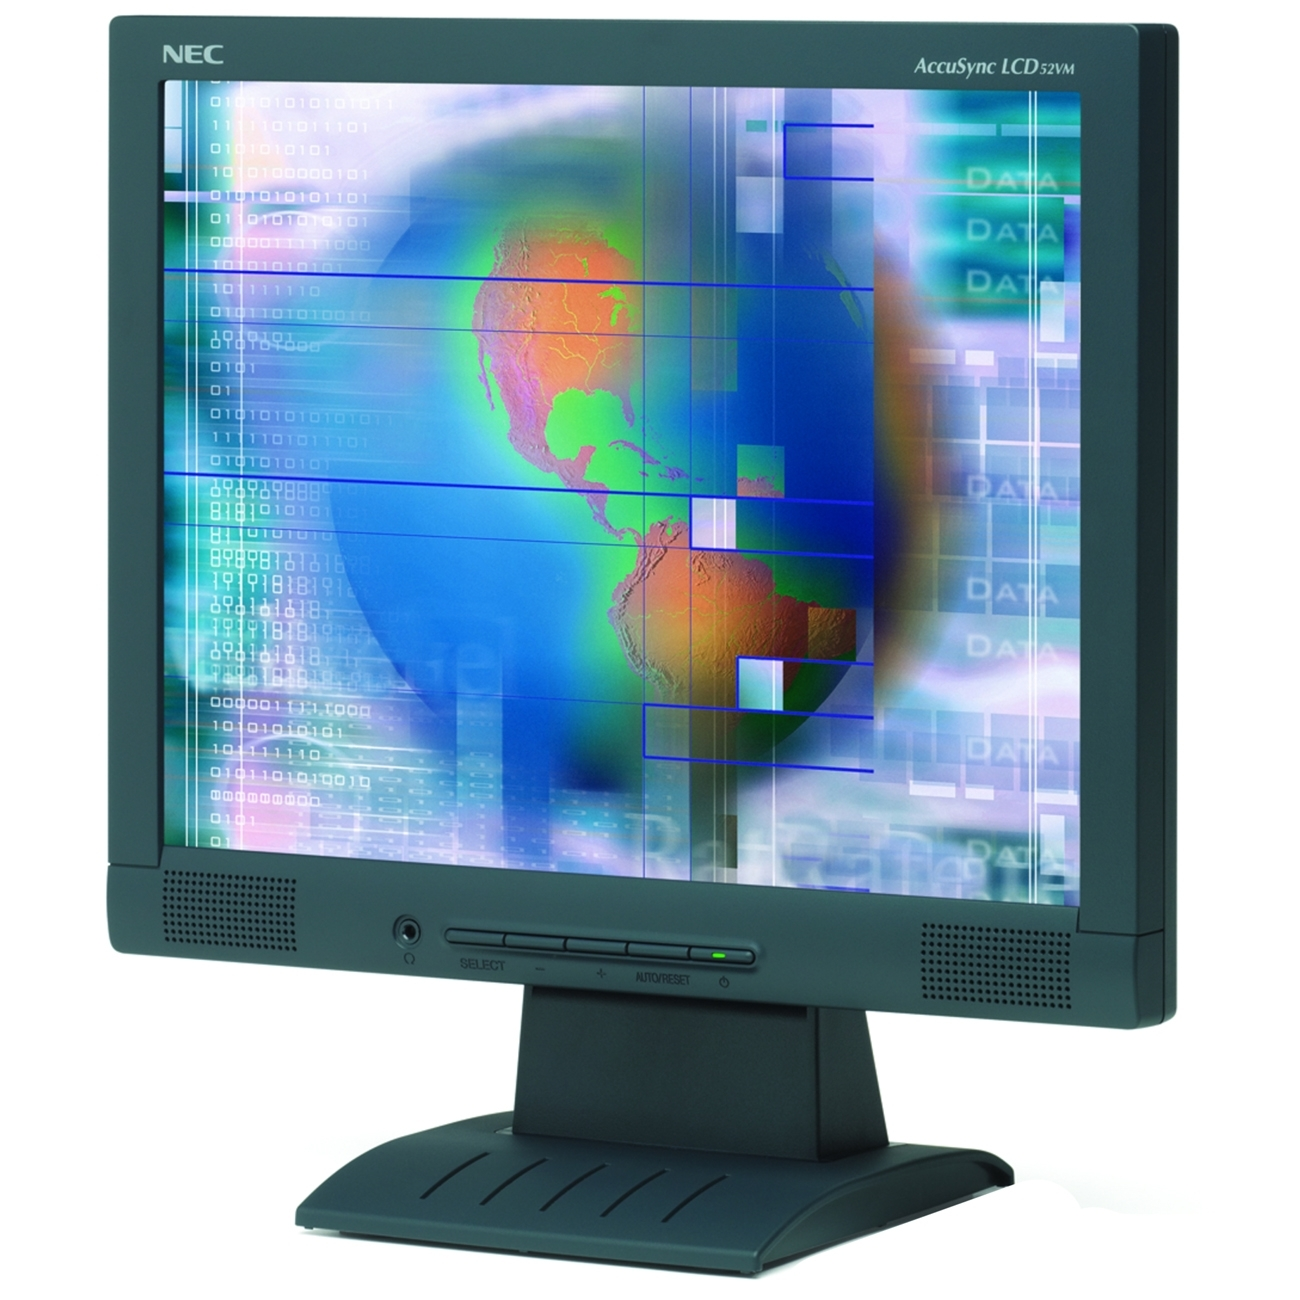 NEC AccuSync LCD193WXM Manuals